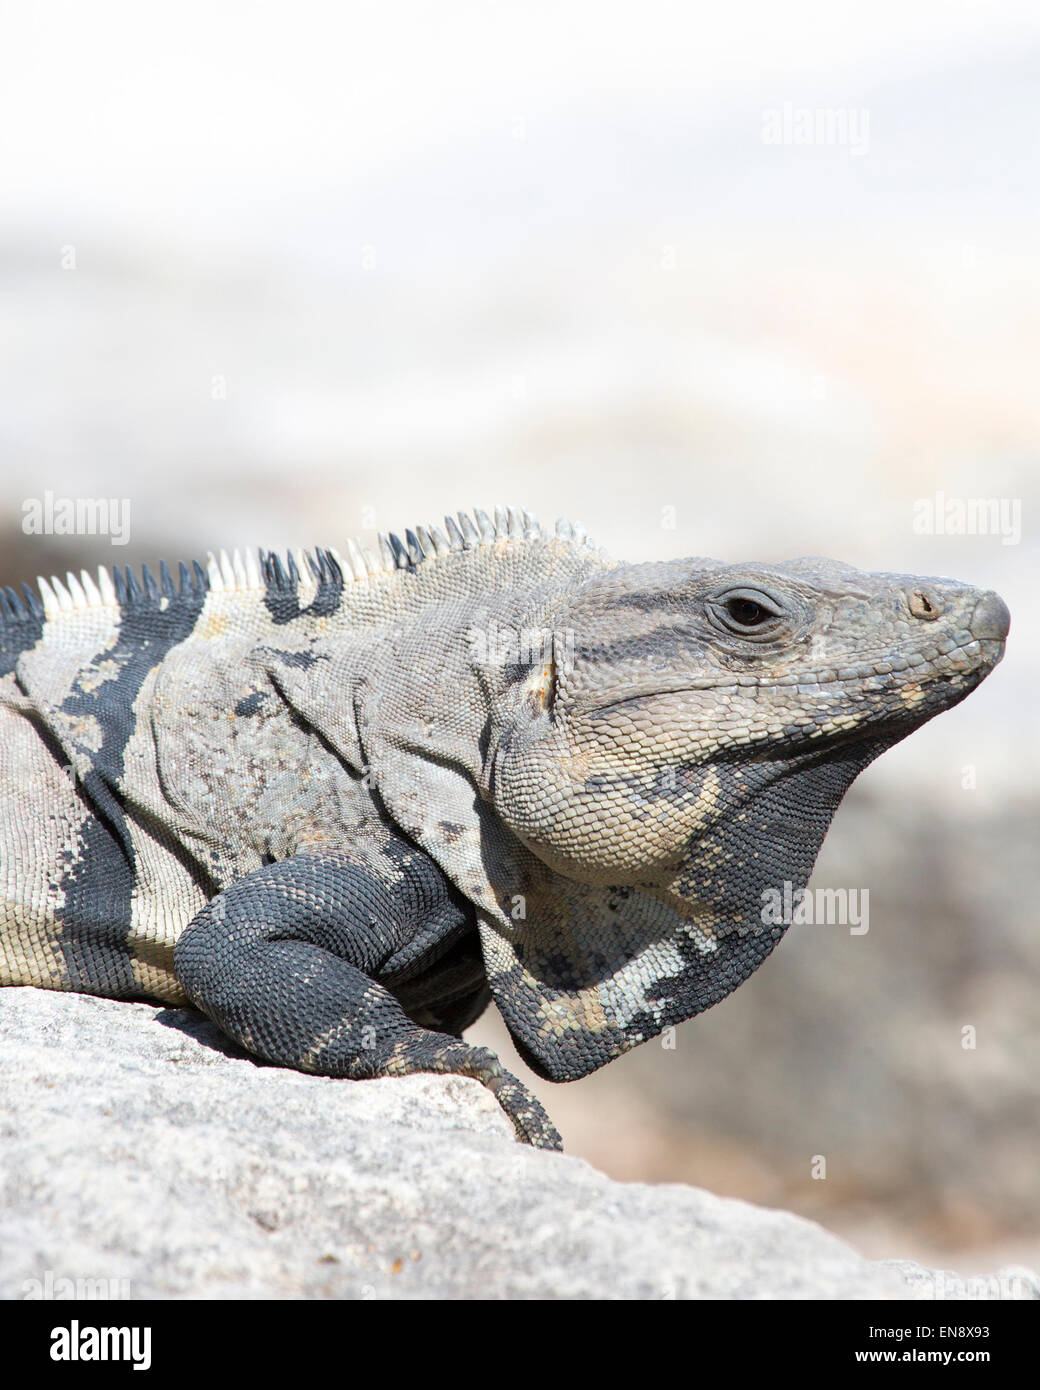 Black Spiny-tailed Iguana (Ctenosaura similis) at Sandos Caracol Eco Resort on the Yucatan peninsula - Stock Image